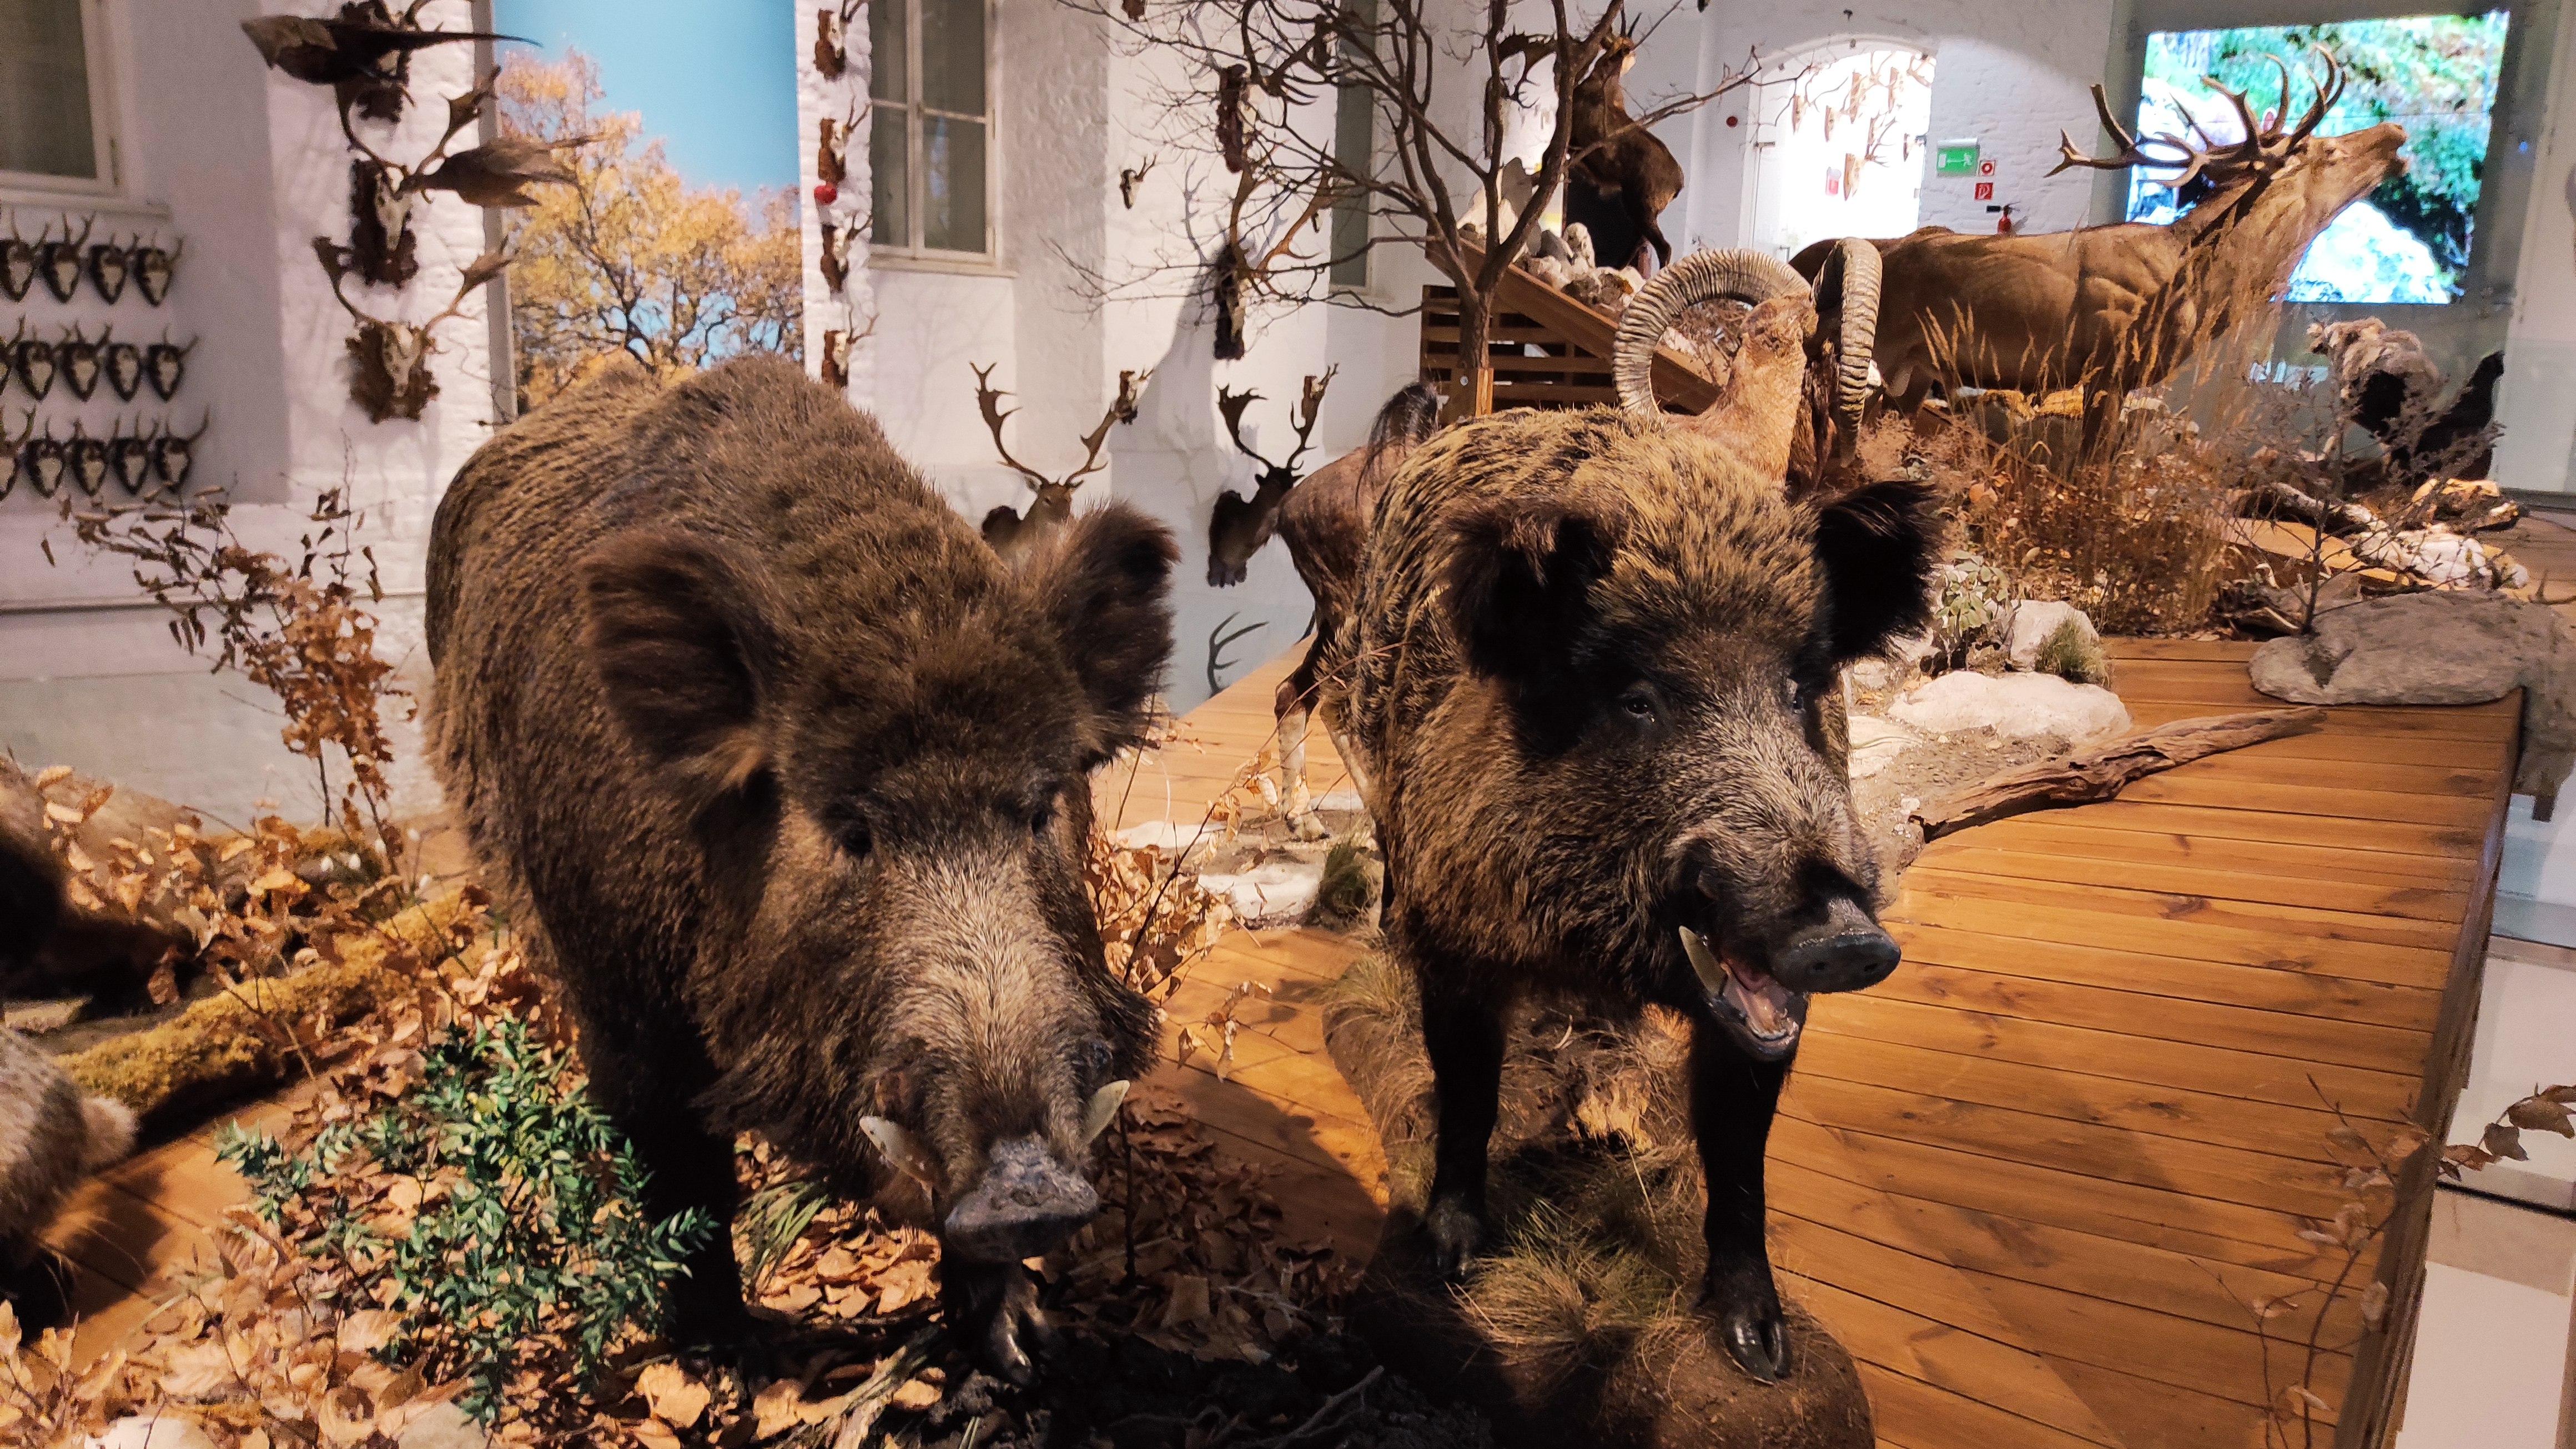 Kirandulastervezo-Hatvan-Vadaszati-Muzeum-5.jpg